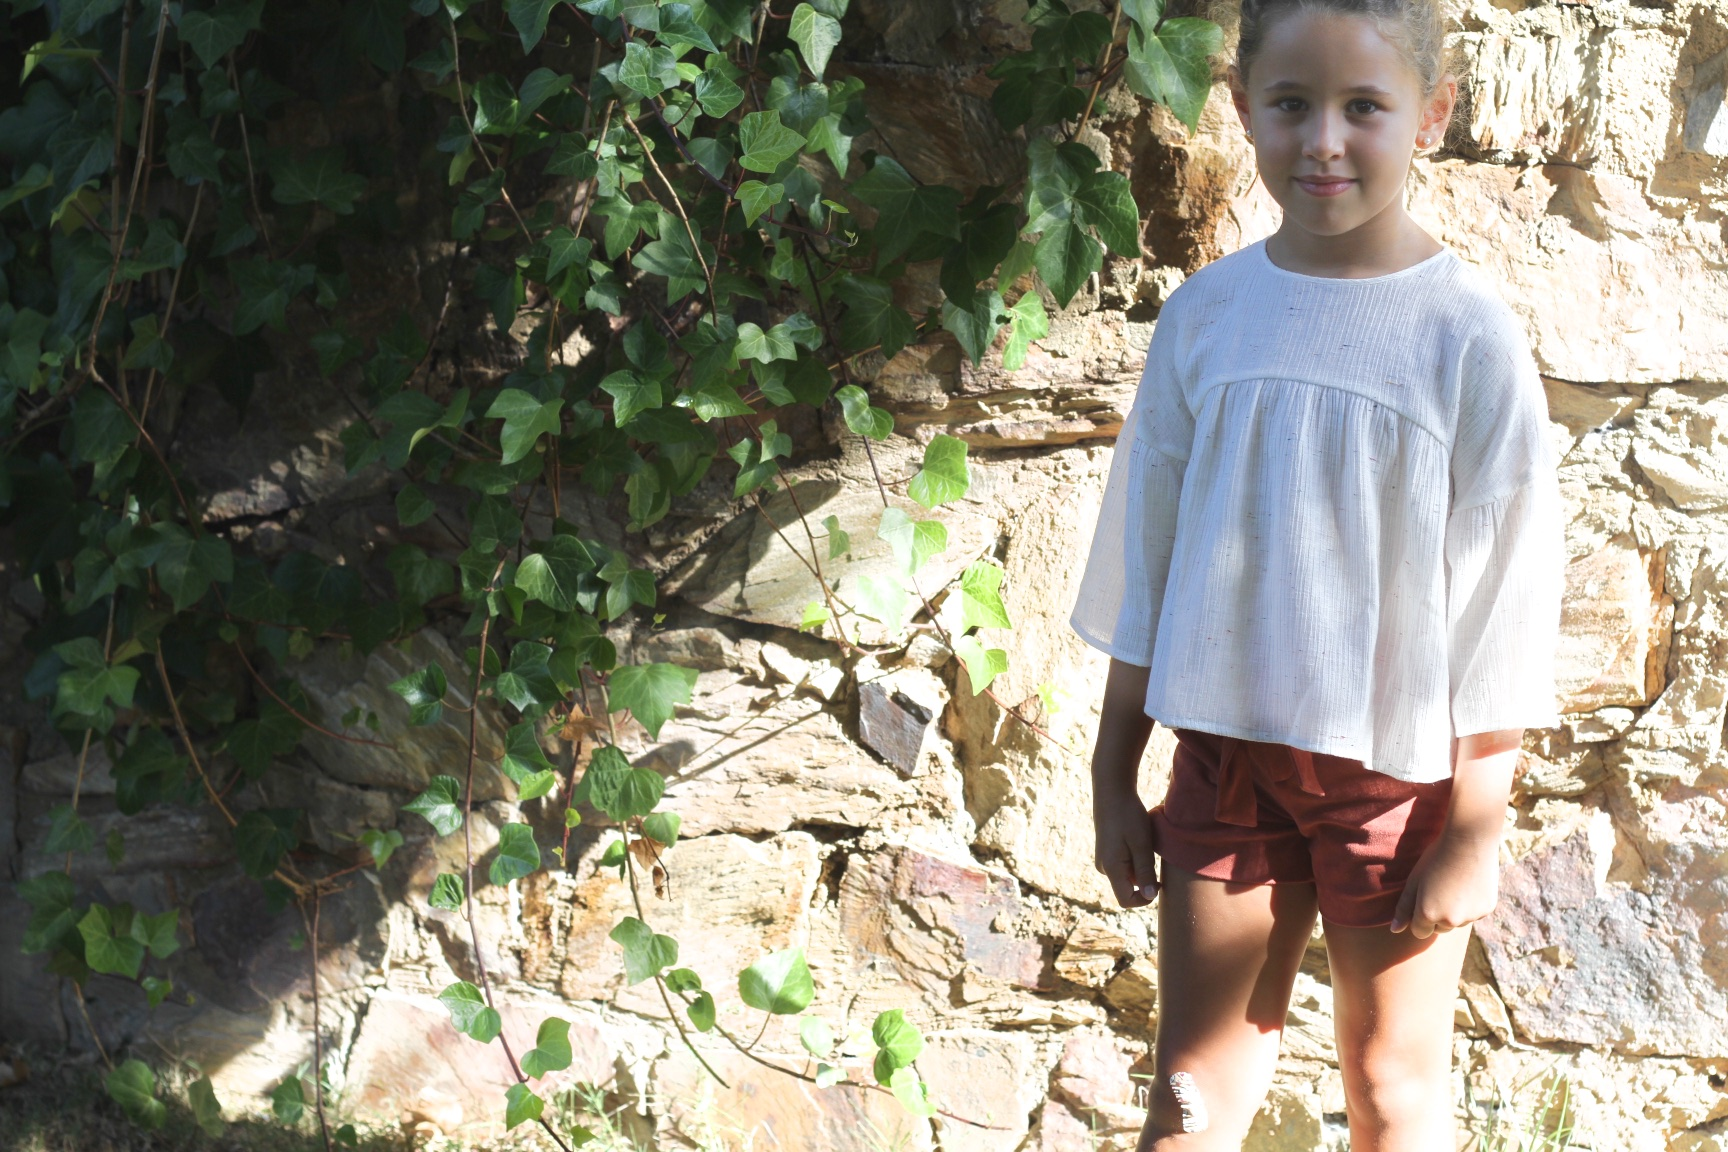 moda-niños-style-zara-kids-jimena-descalzaporelparque